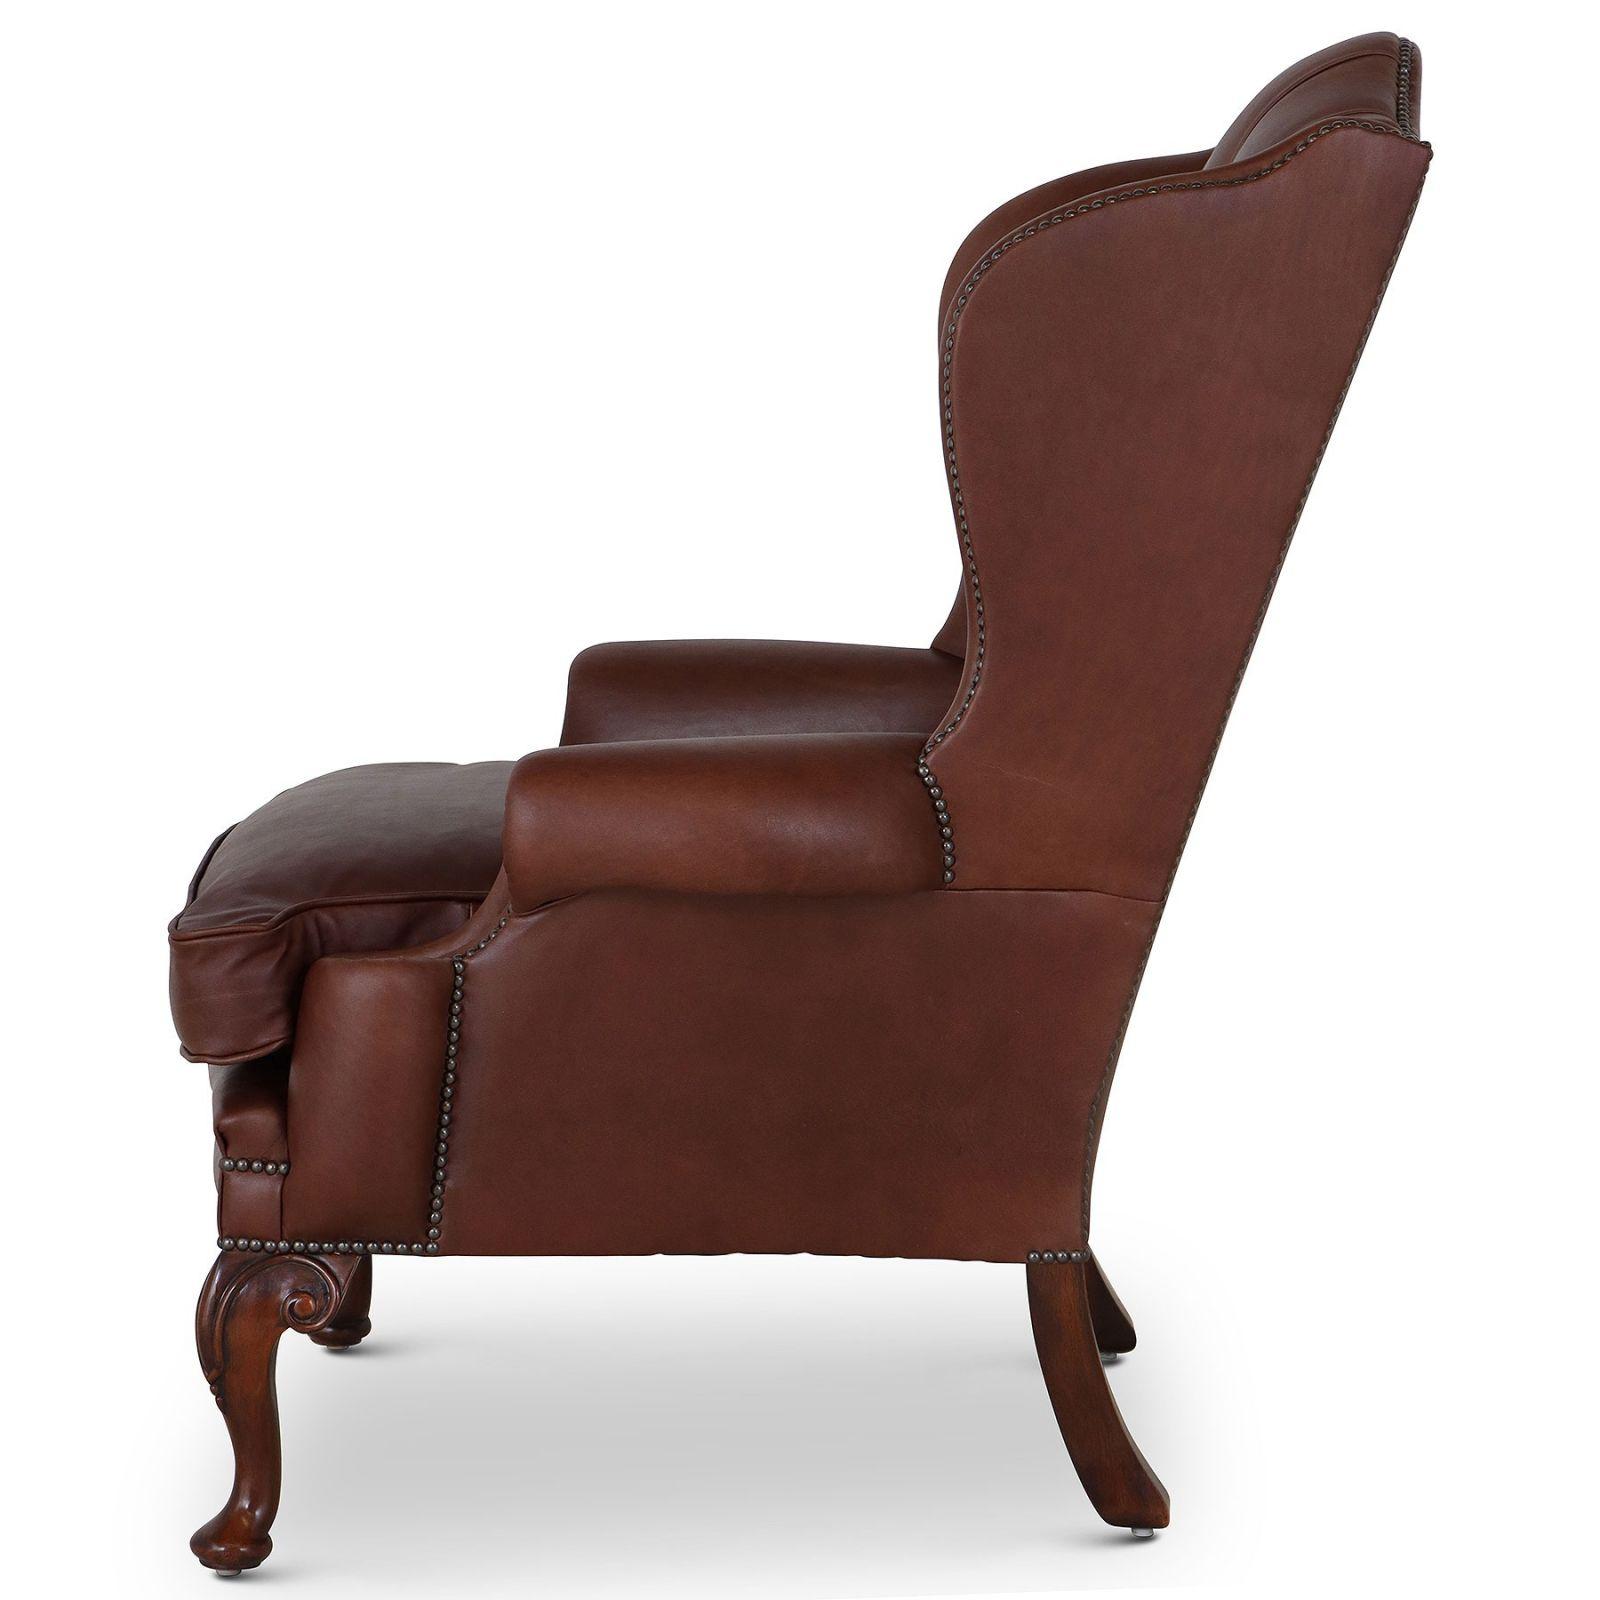 Hambledon Leather Wing Chair - Mahogany